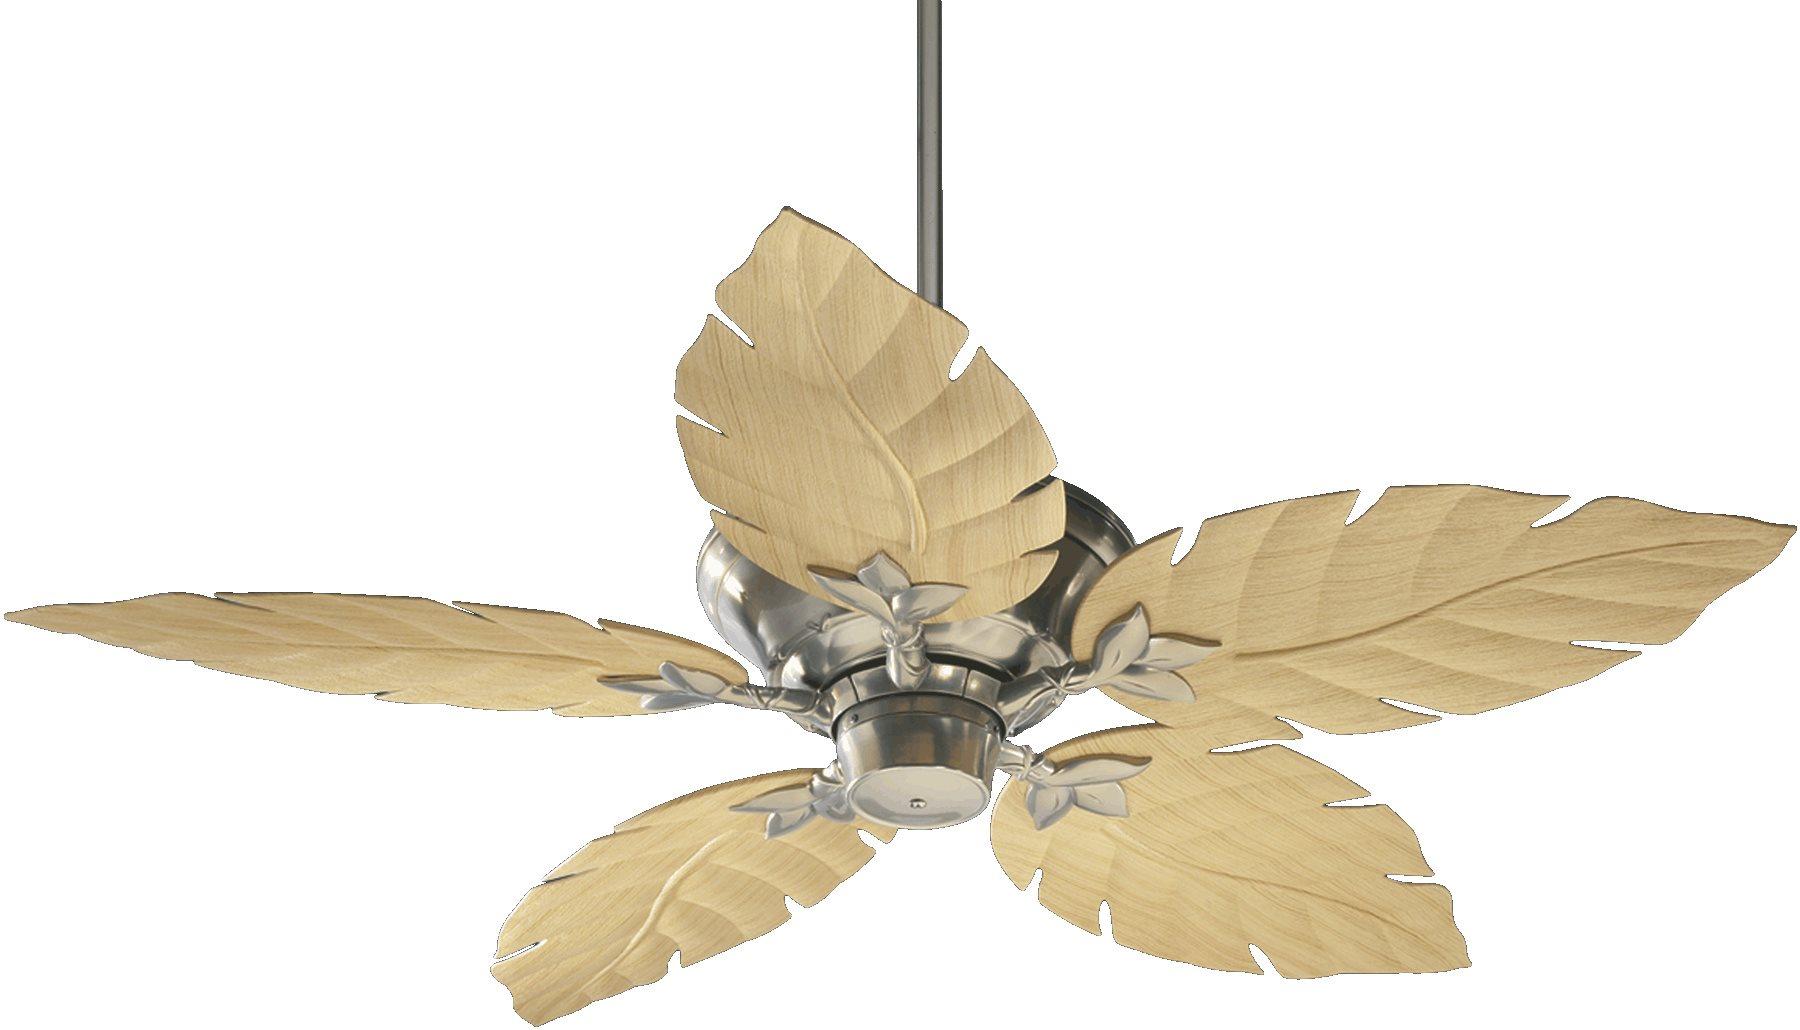 Quorum Lighting 135525 Monaco 52 Patio Tropical Ceiling Fan Qr 135525